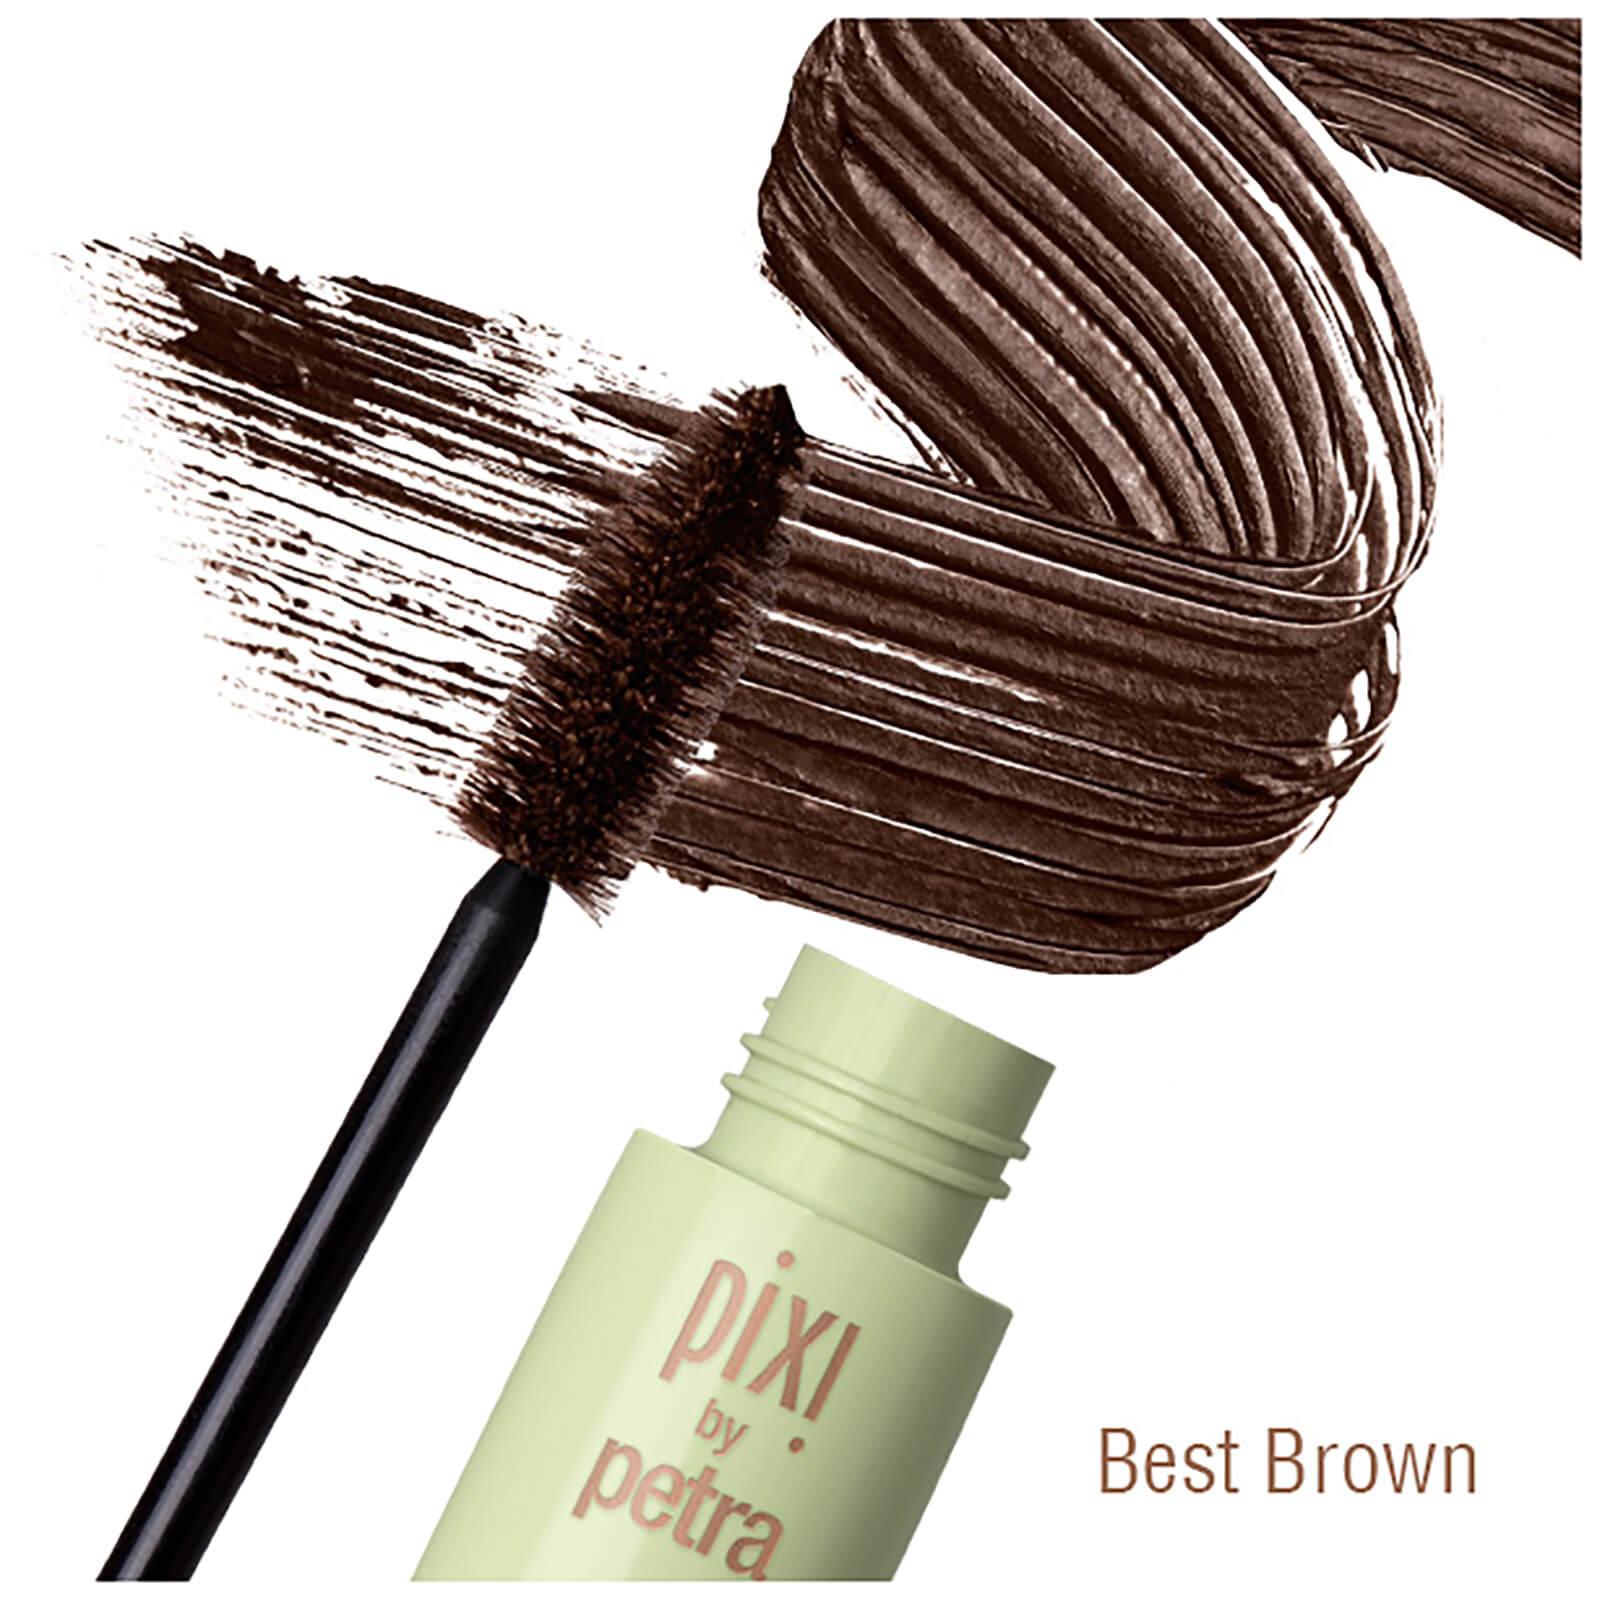 Pixi MascaraLargeLash dePixi - Best Brown